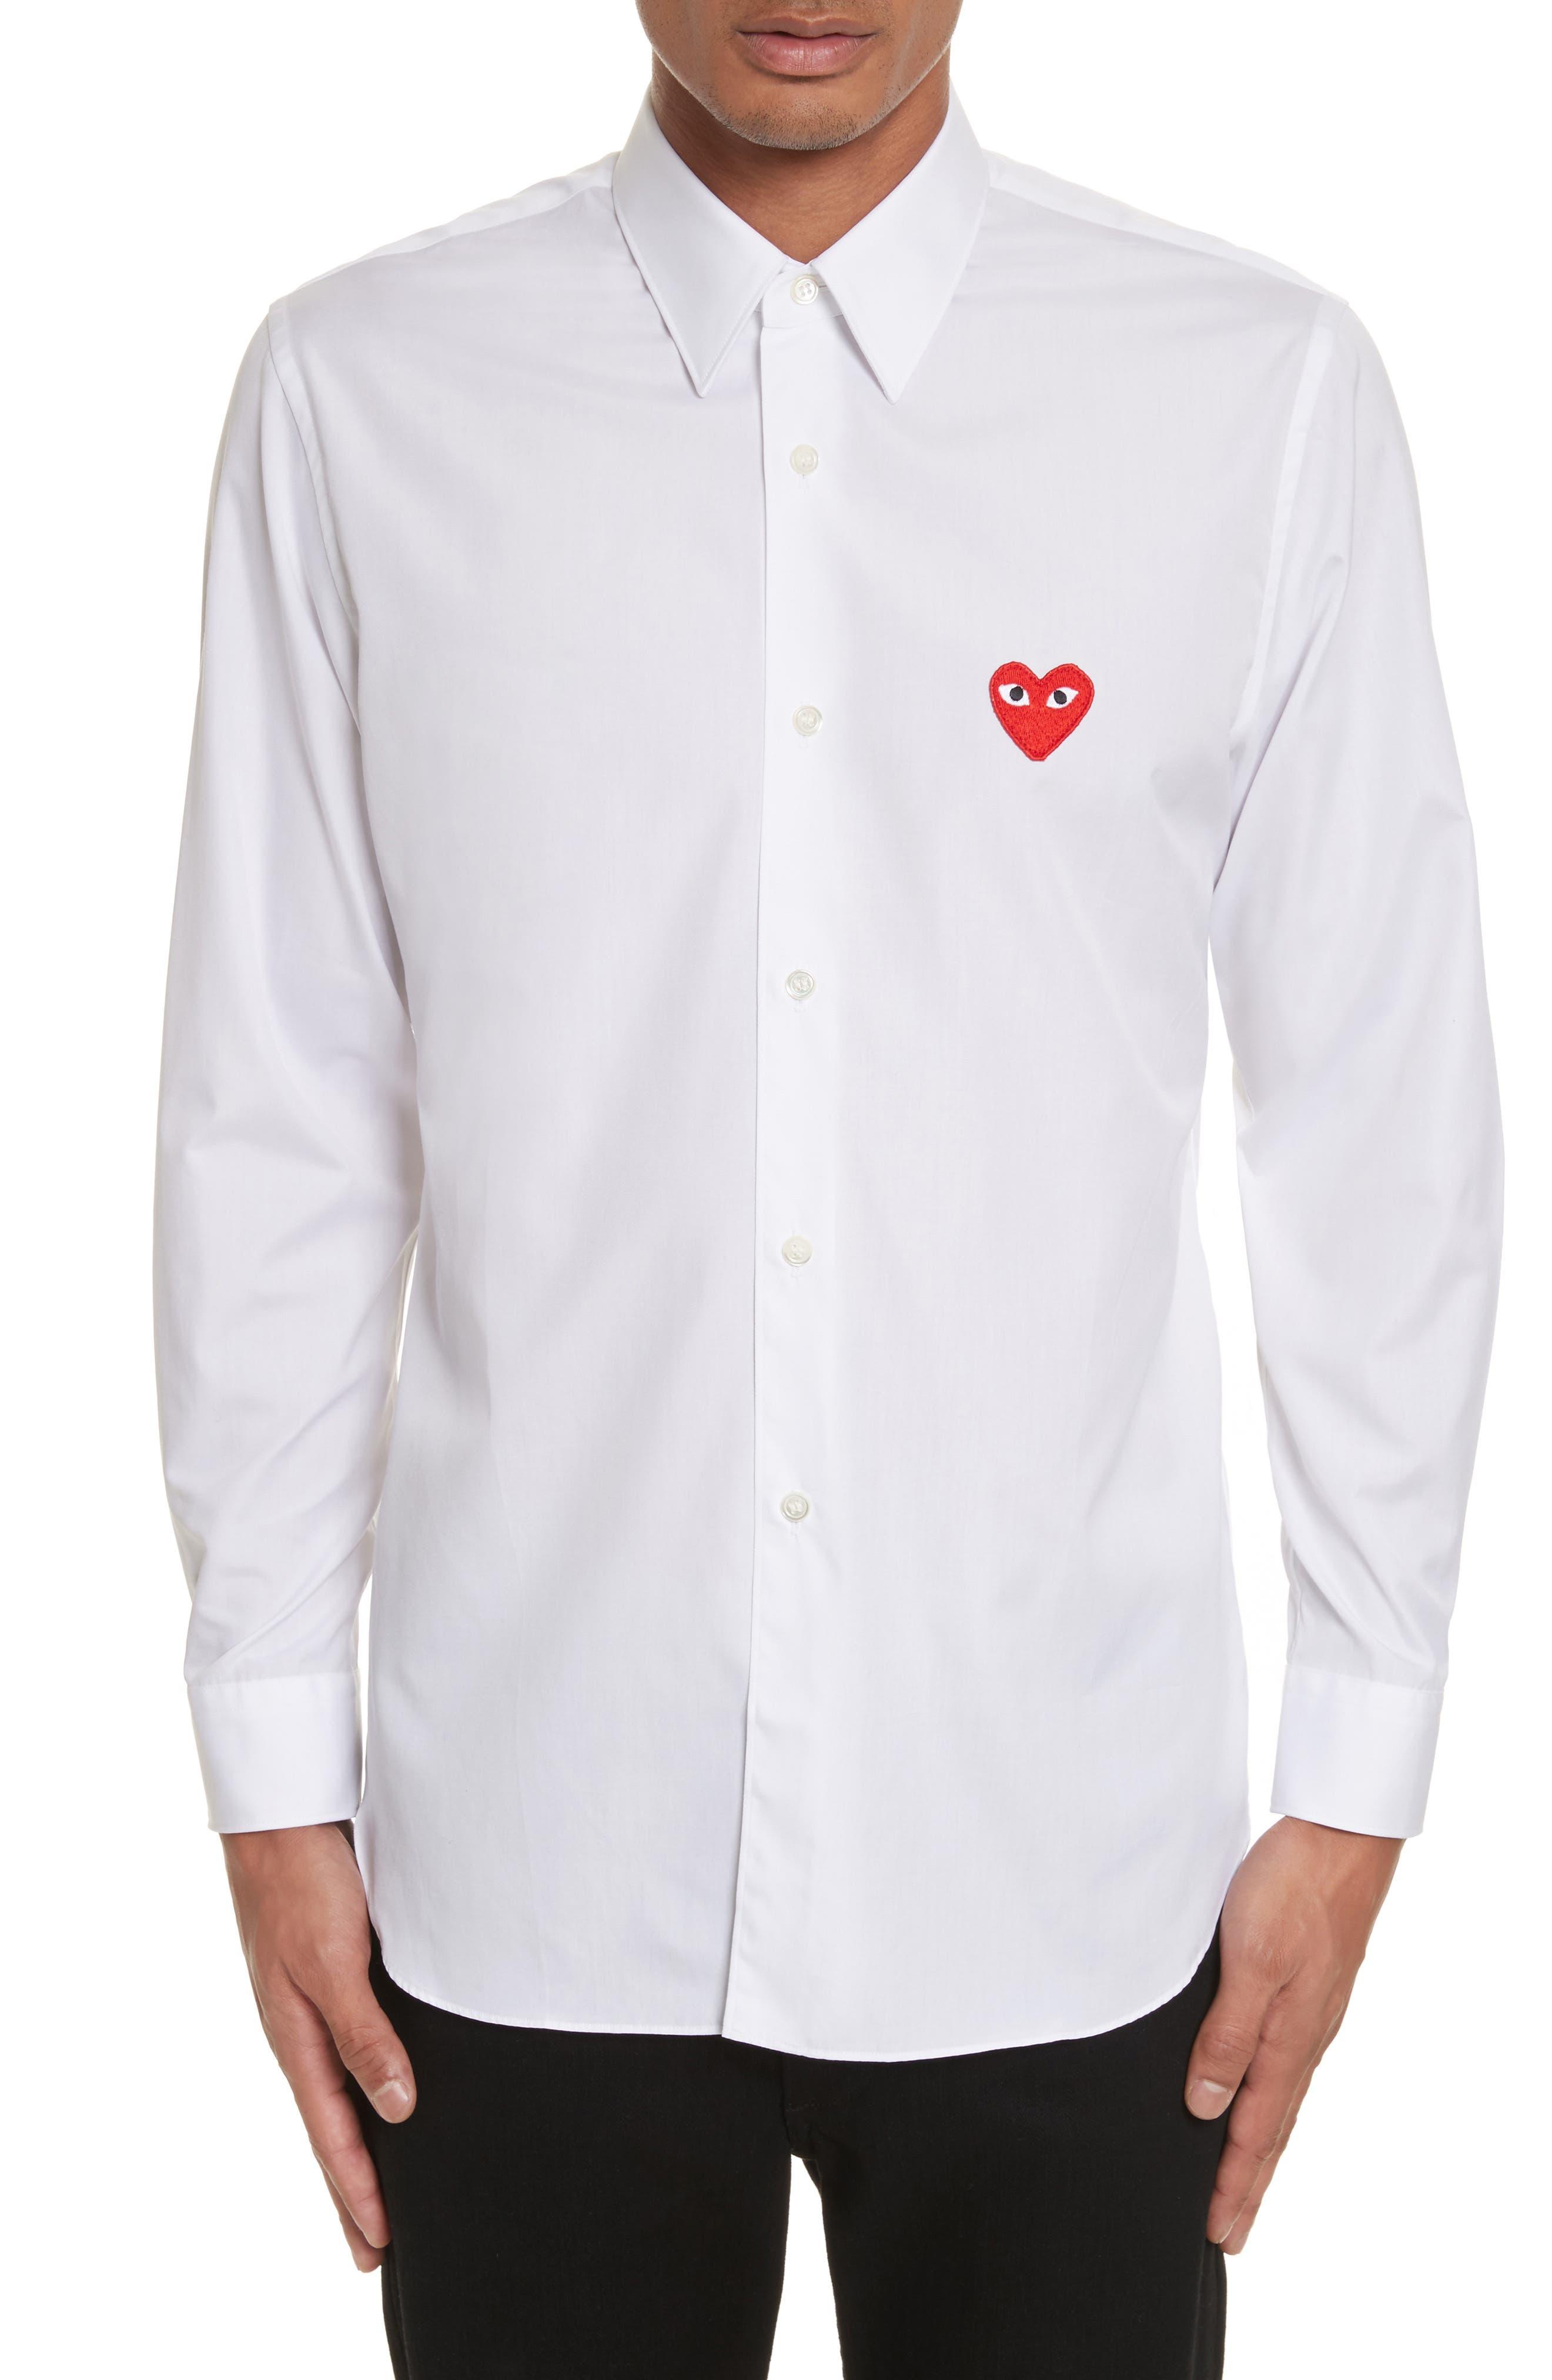 Alternate Image 1 Selected - Comme des Garçons PLAY Woven Cotton Shirt